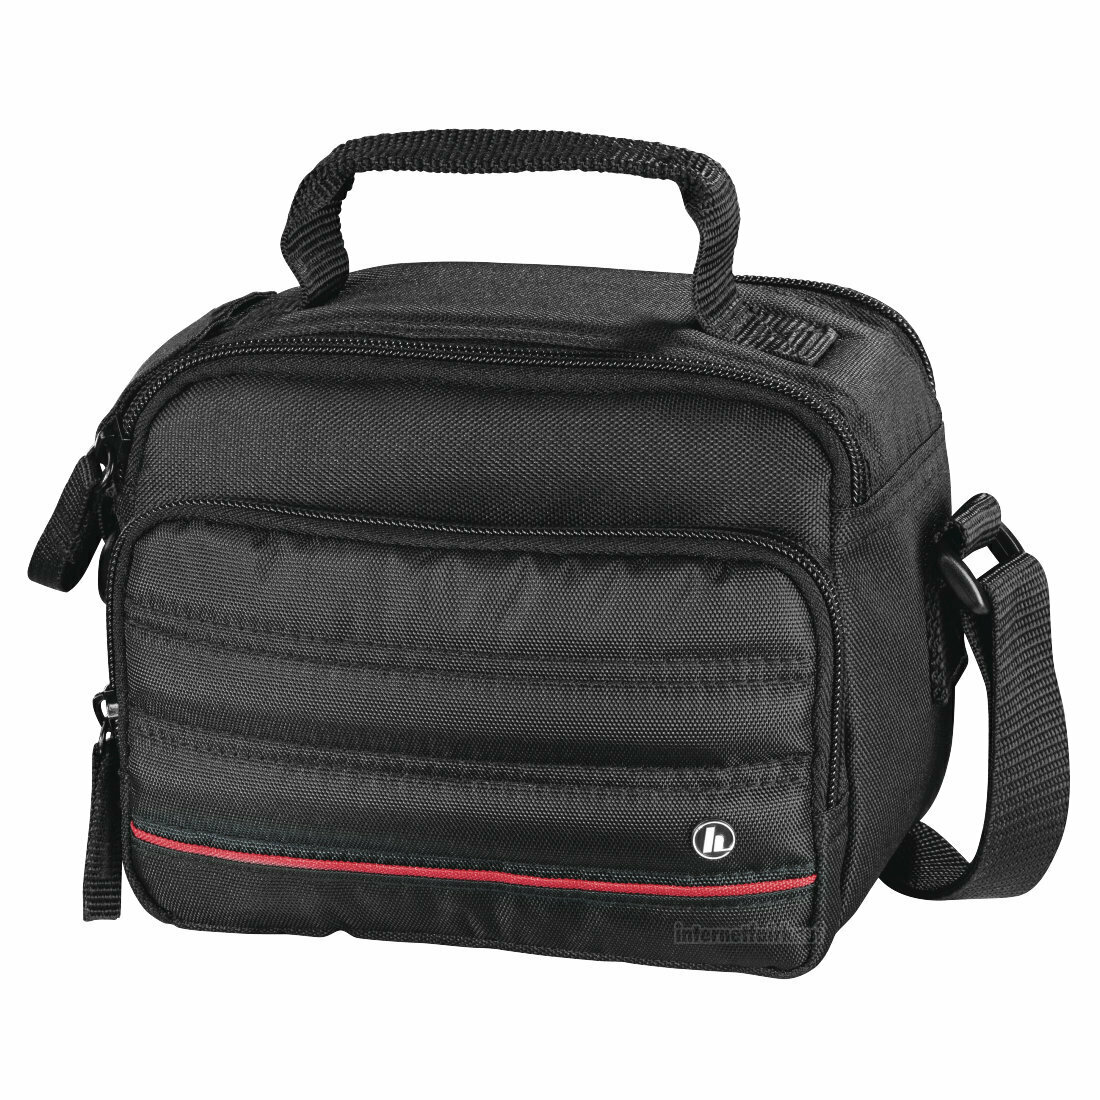 Tasche Fototasche passend für Fuji Fujifilm X-Pro3 X-Pro2